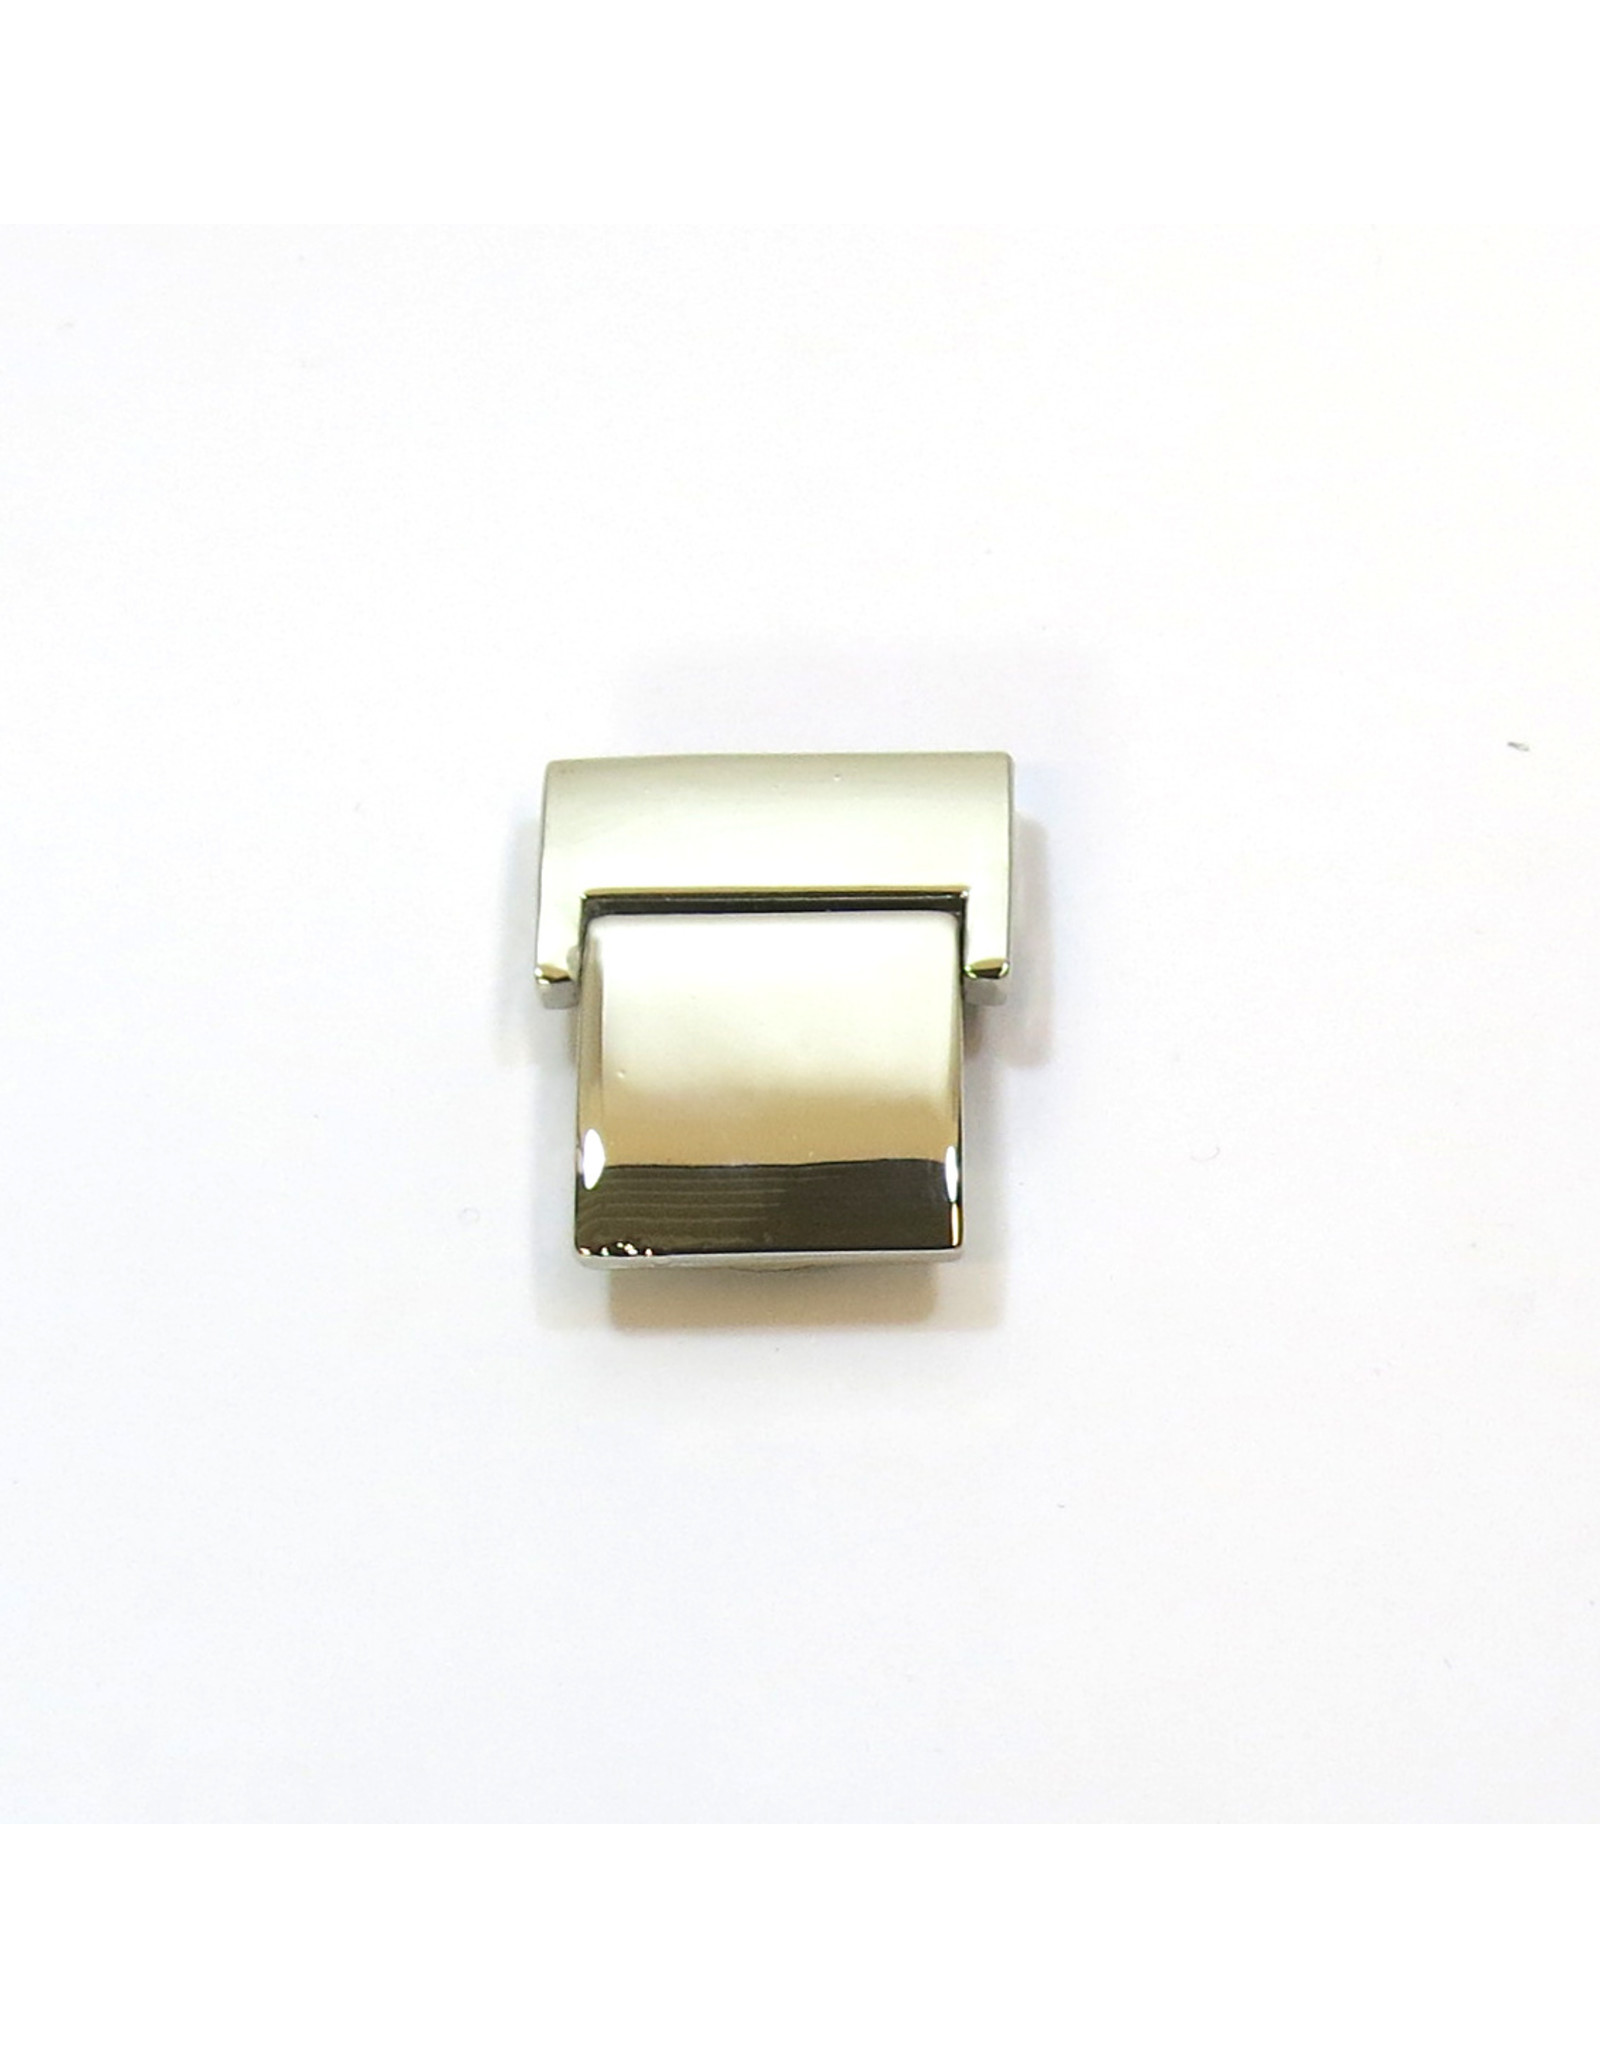 Purse/bag lock magnetic